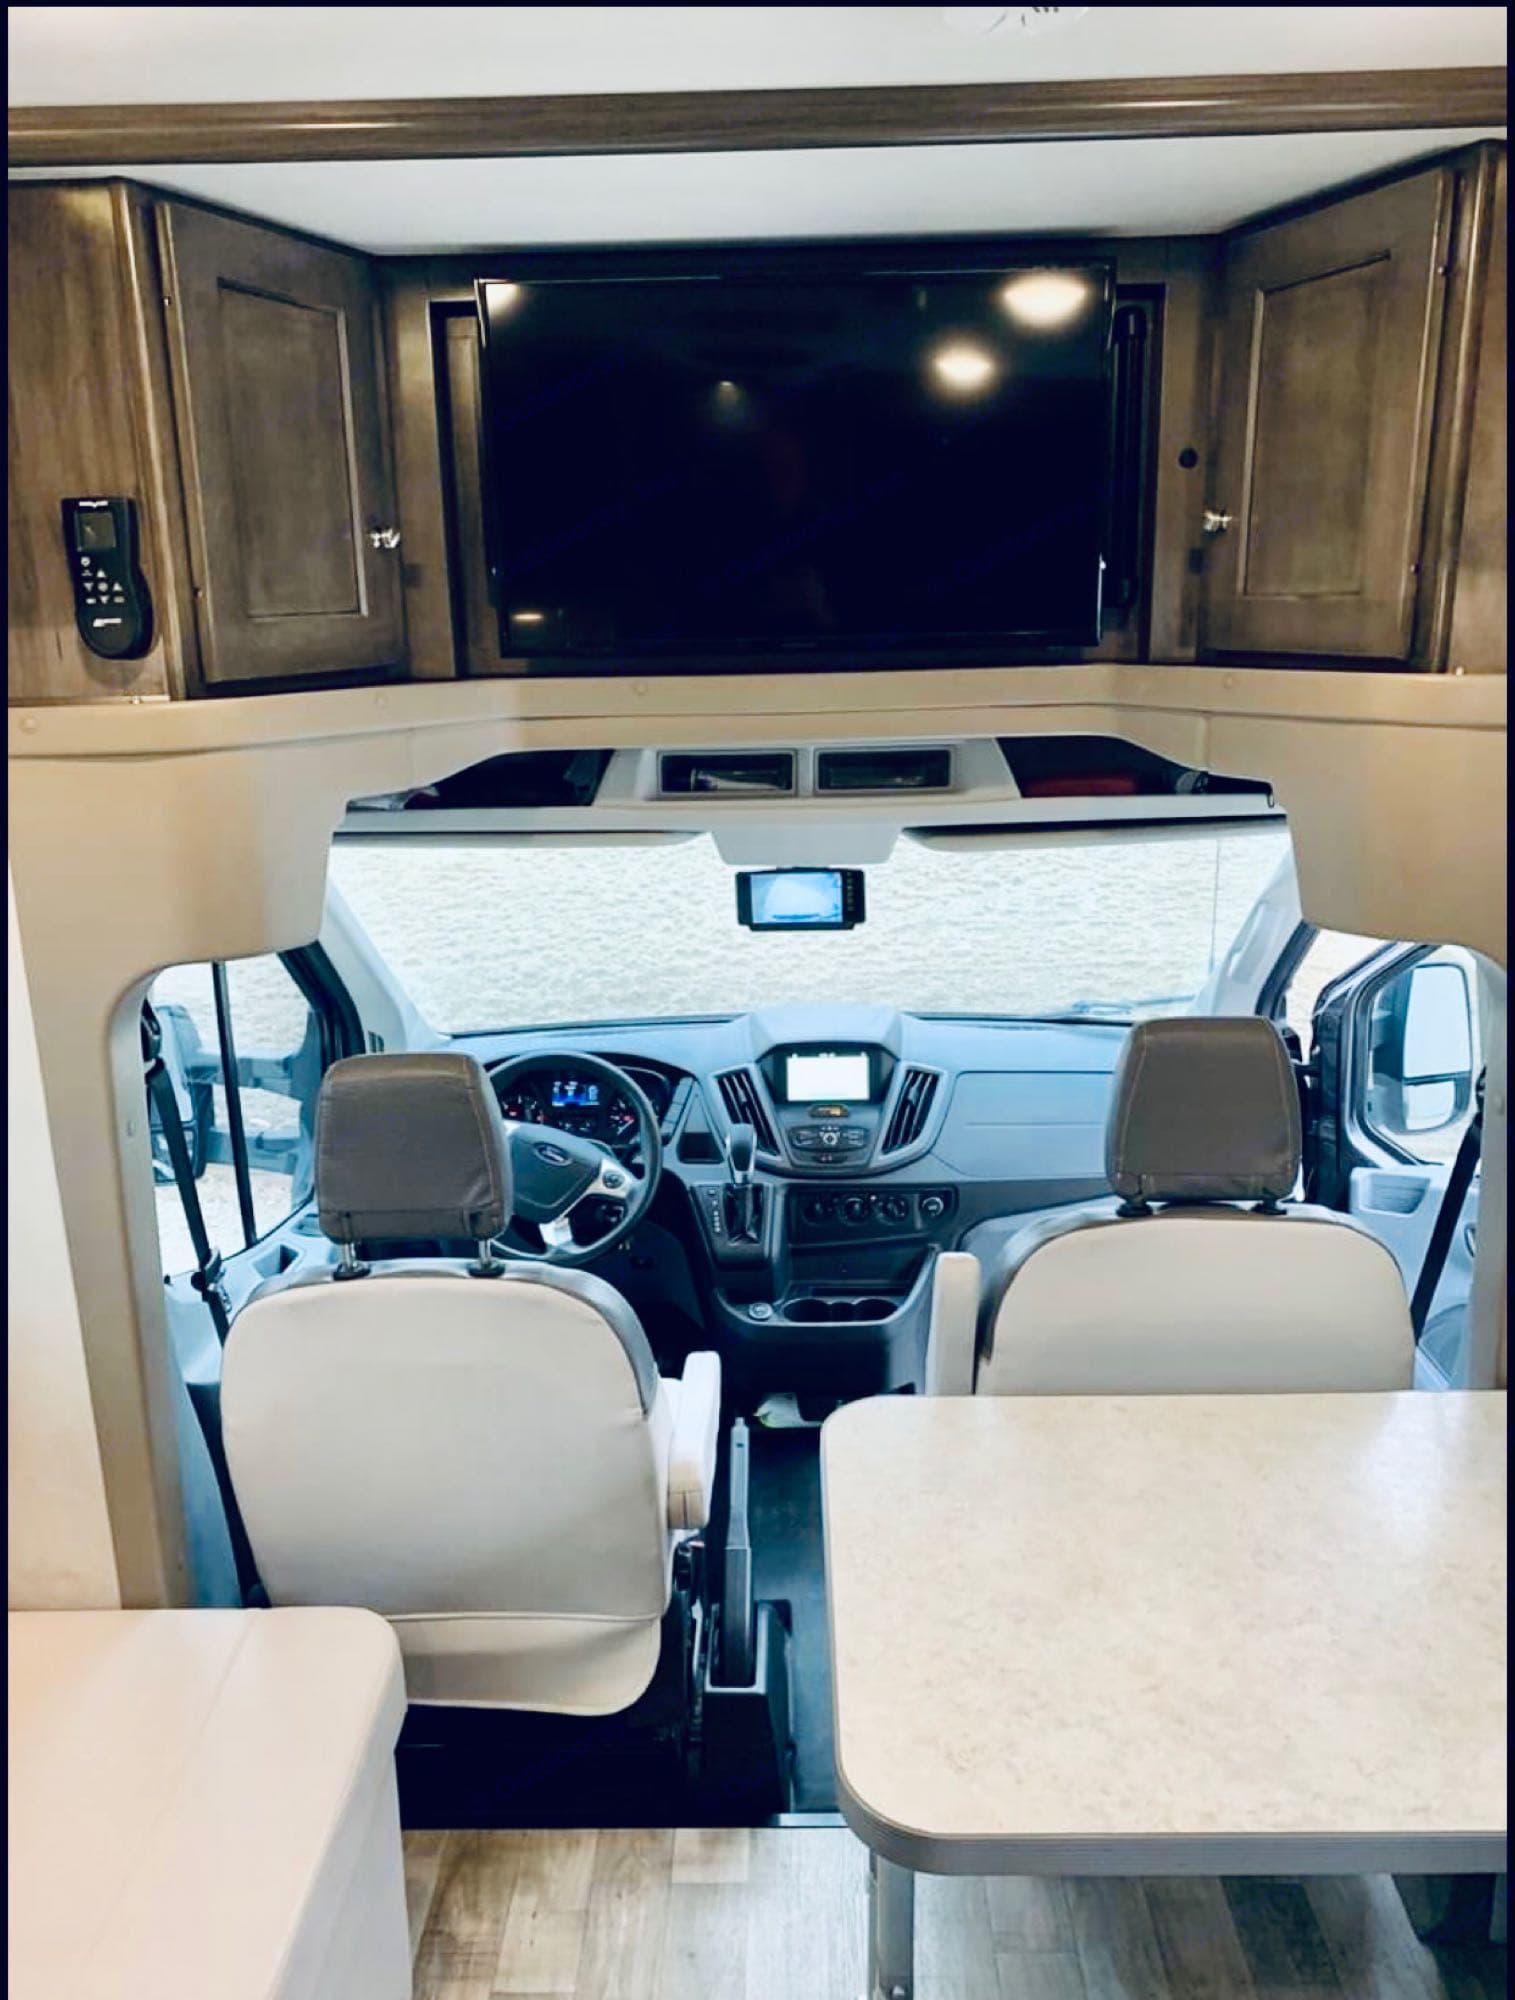 Passenger swivel to dinette seating. Entertainment system, and rearview camera. Satelitte/bluetooth capabilities. . Winnebago Ford Transit Winnebago Motorhome 2018